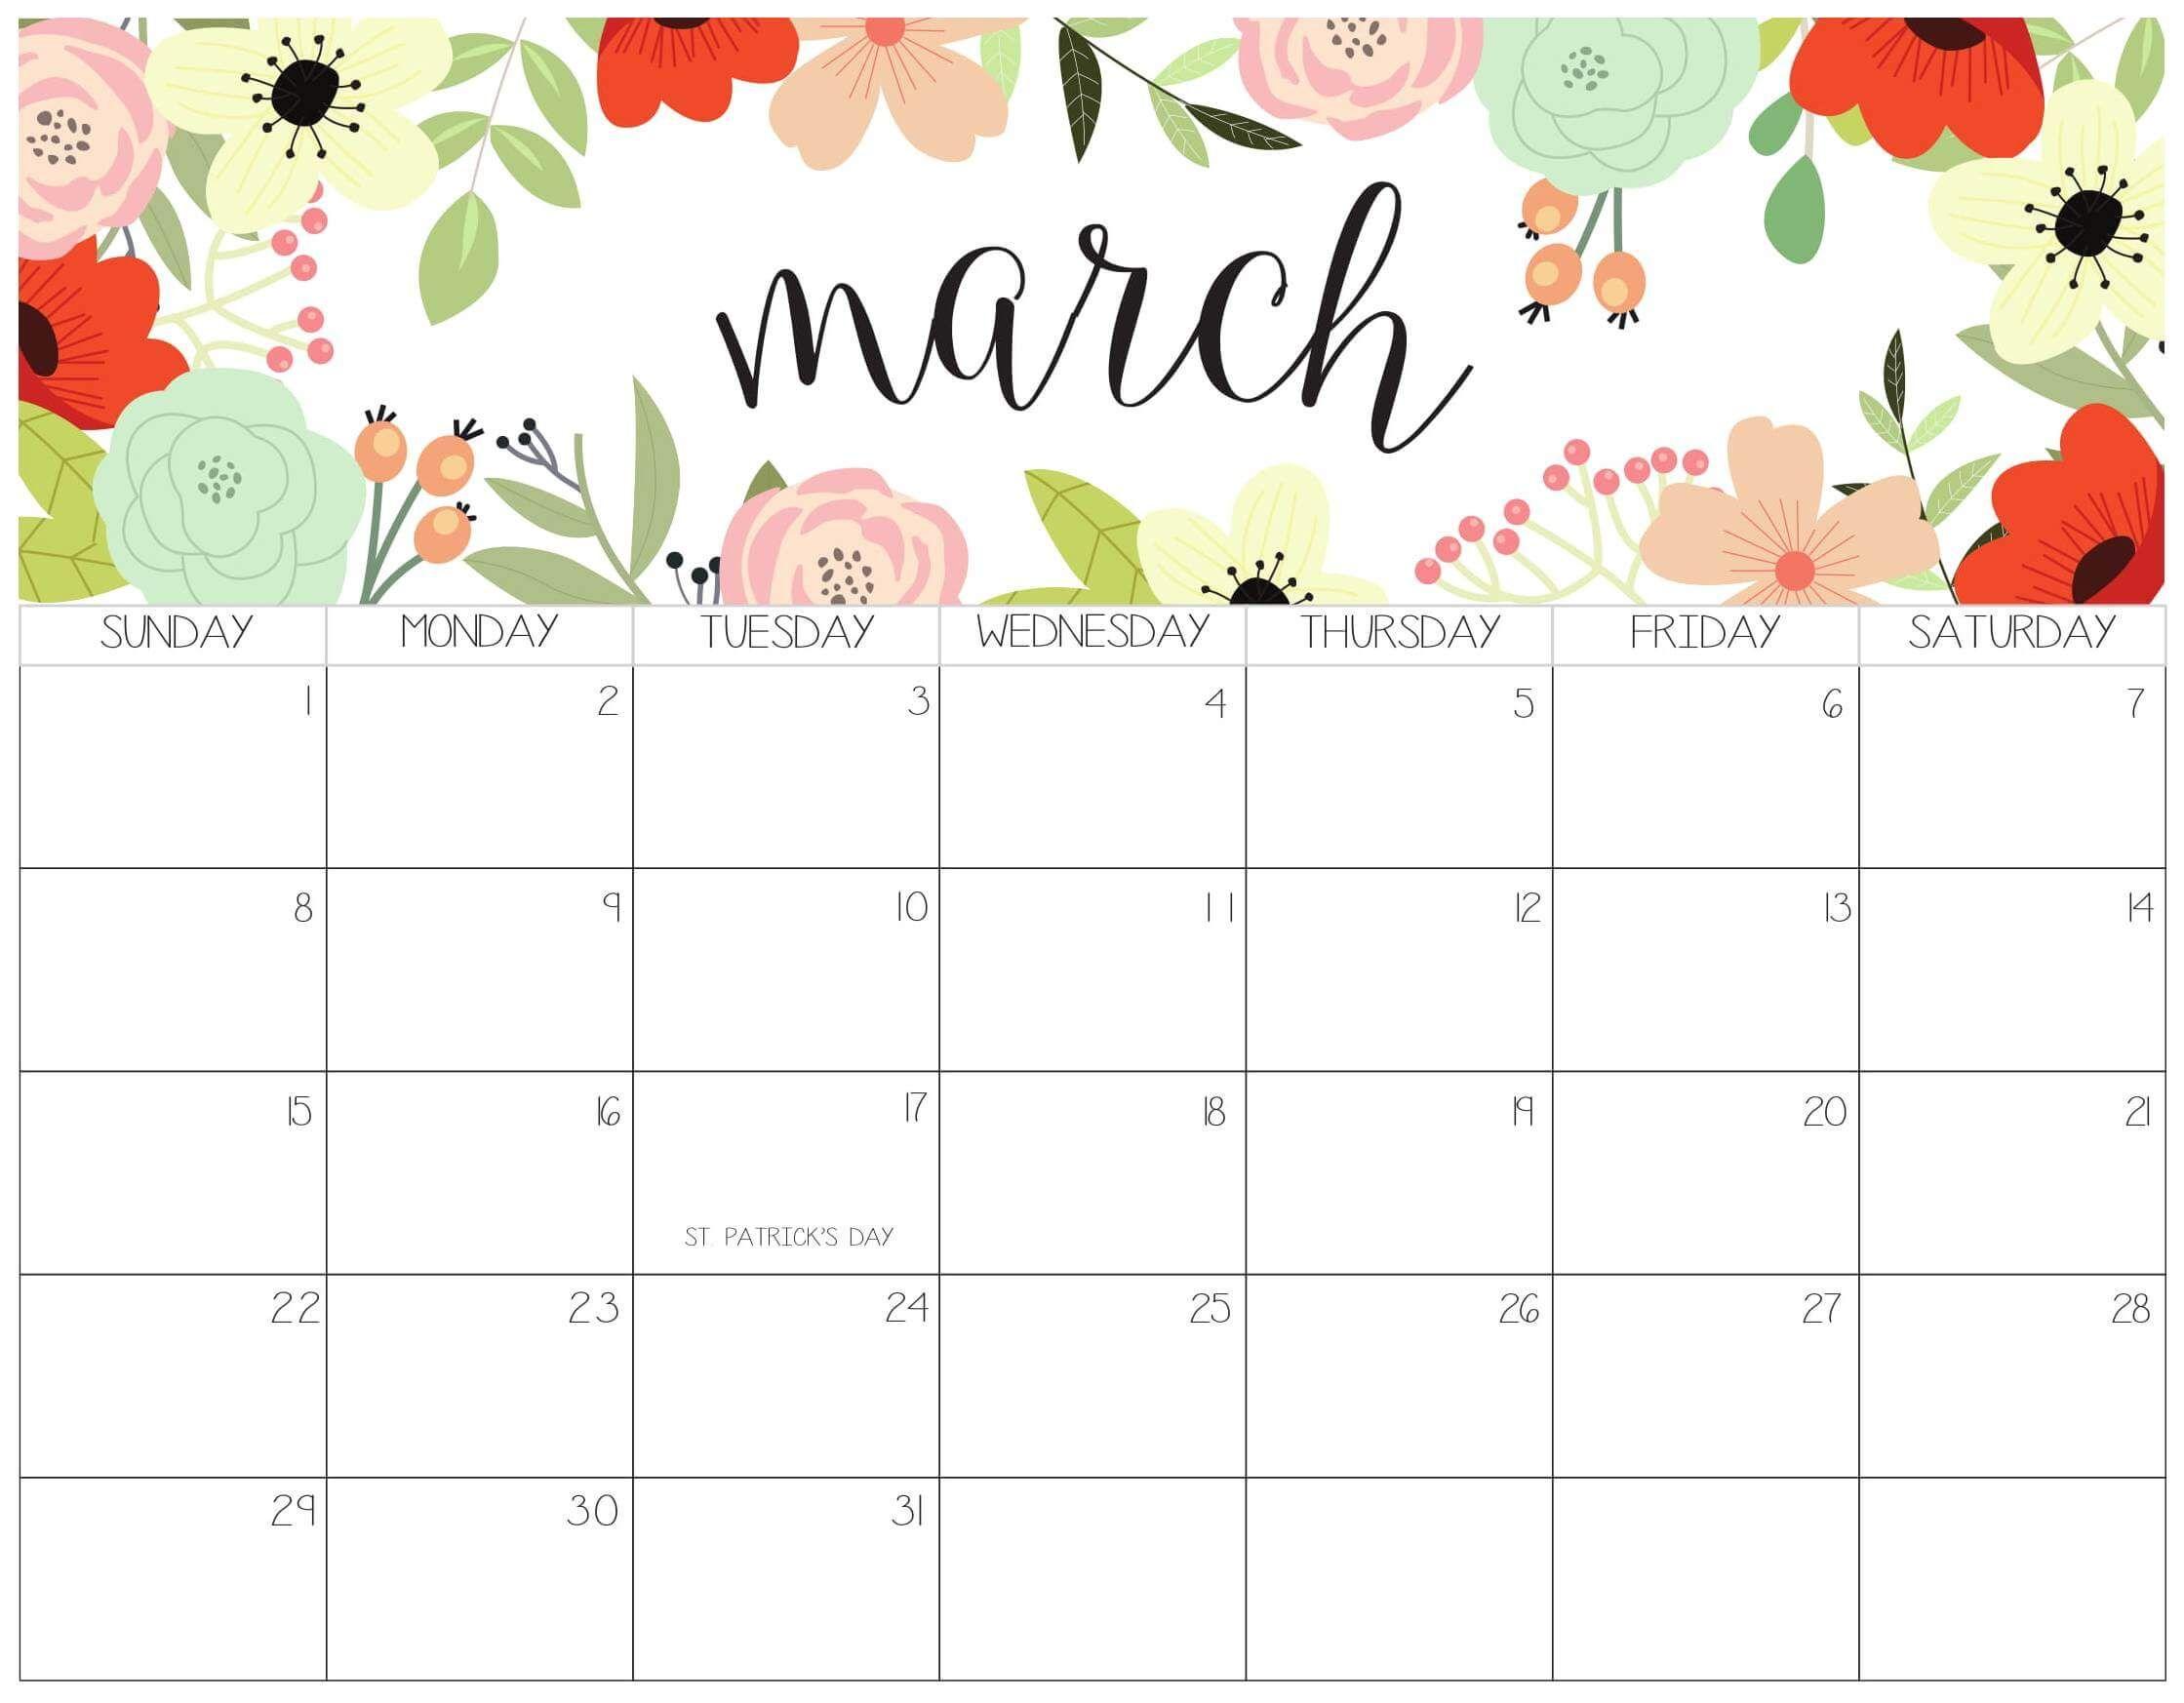 Cute Calendar For March 2020 In 2020 Print Calendar Calendar Printables Calendar Template